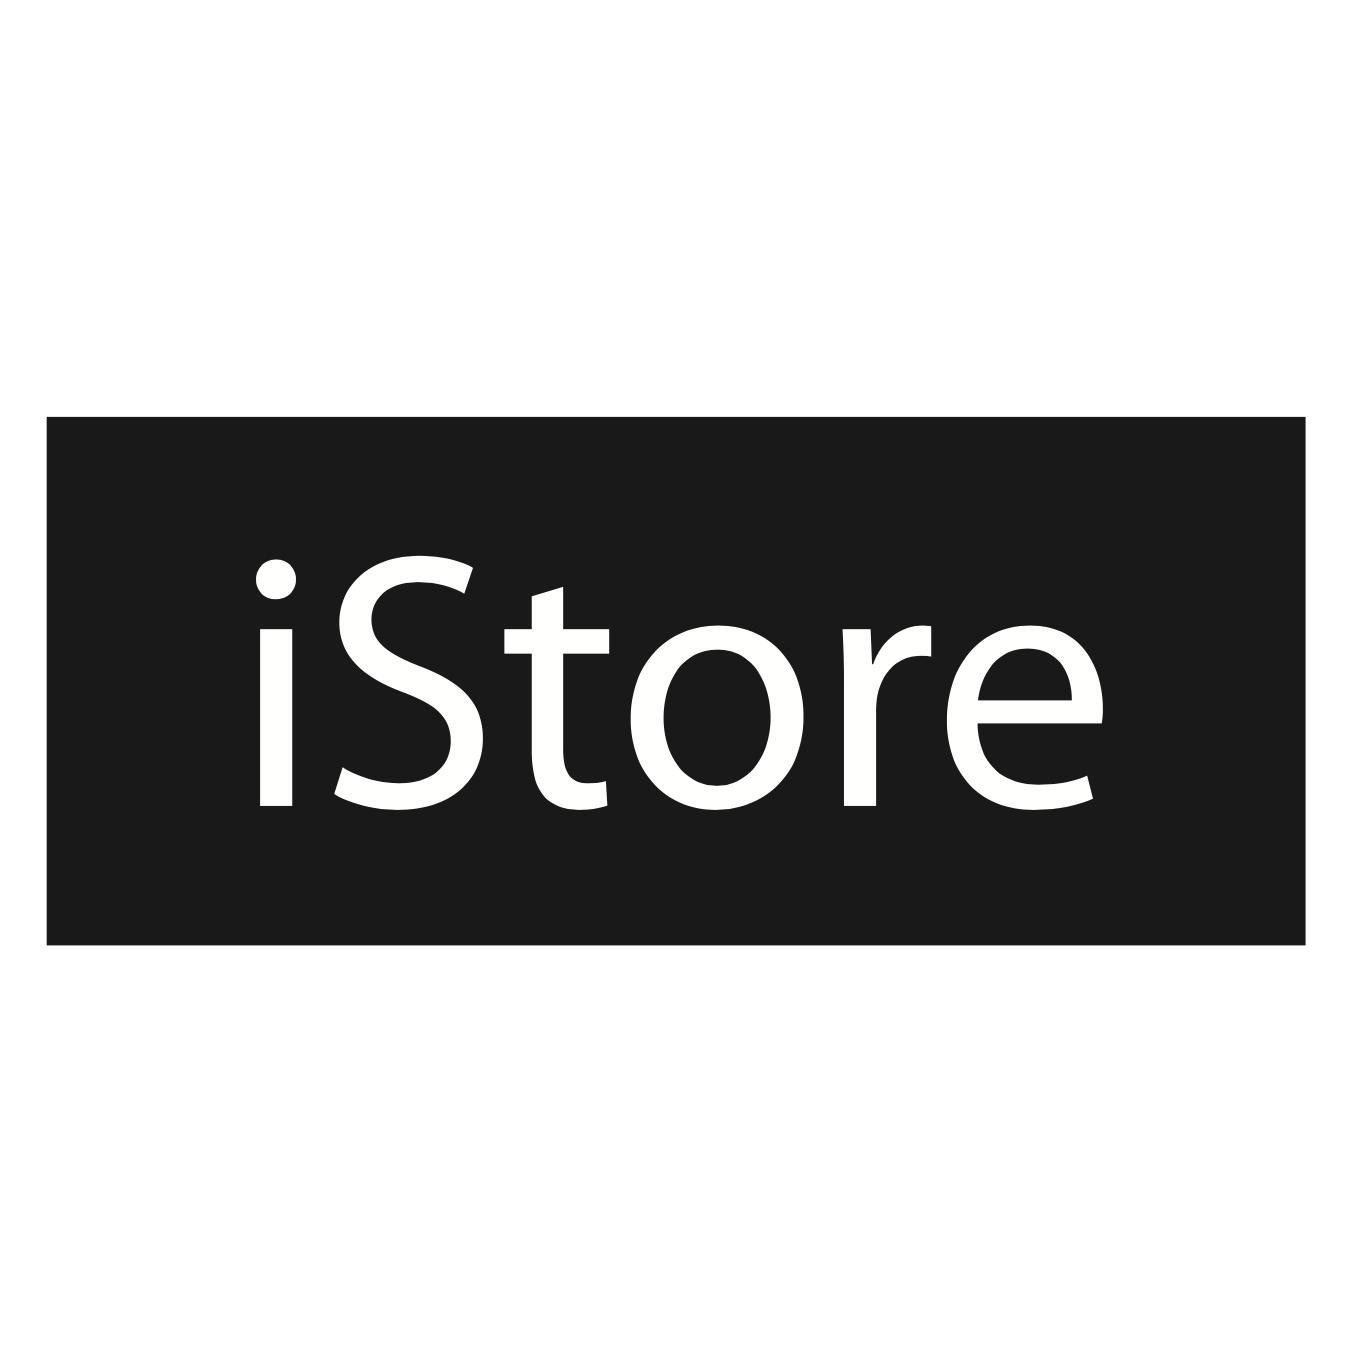 Incase Hardshell Case for 13-inch MacBook Pro Thunderbolt (USB-C) Dots - Blush Pink